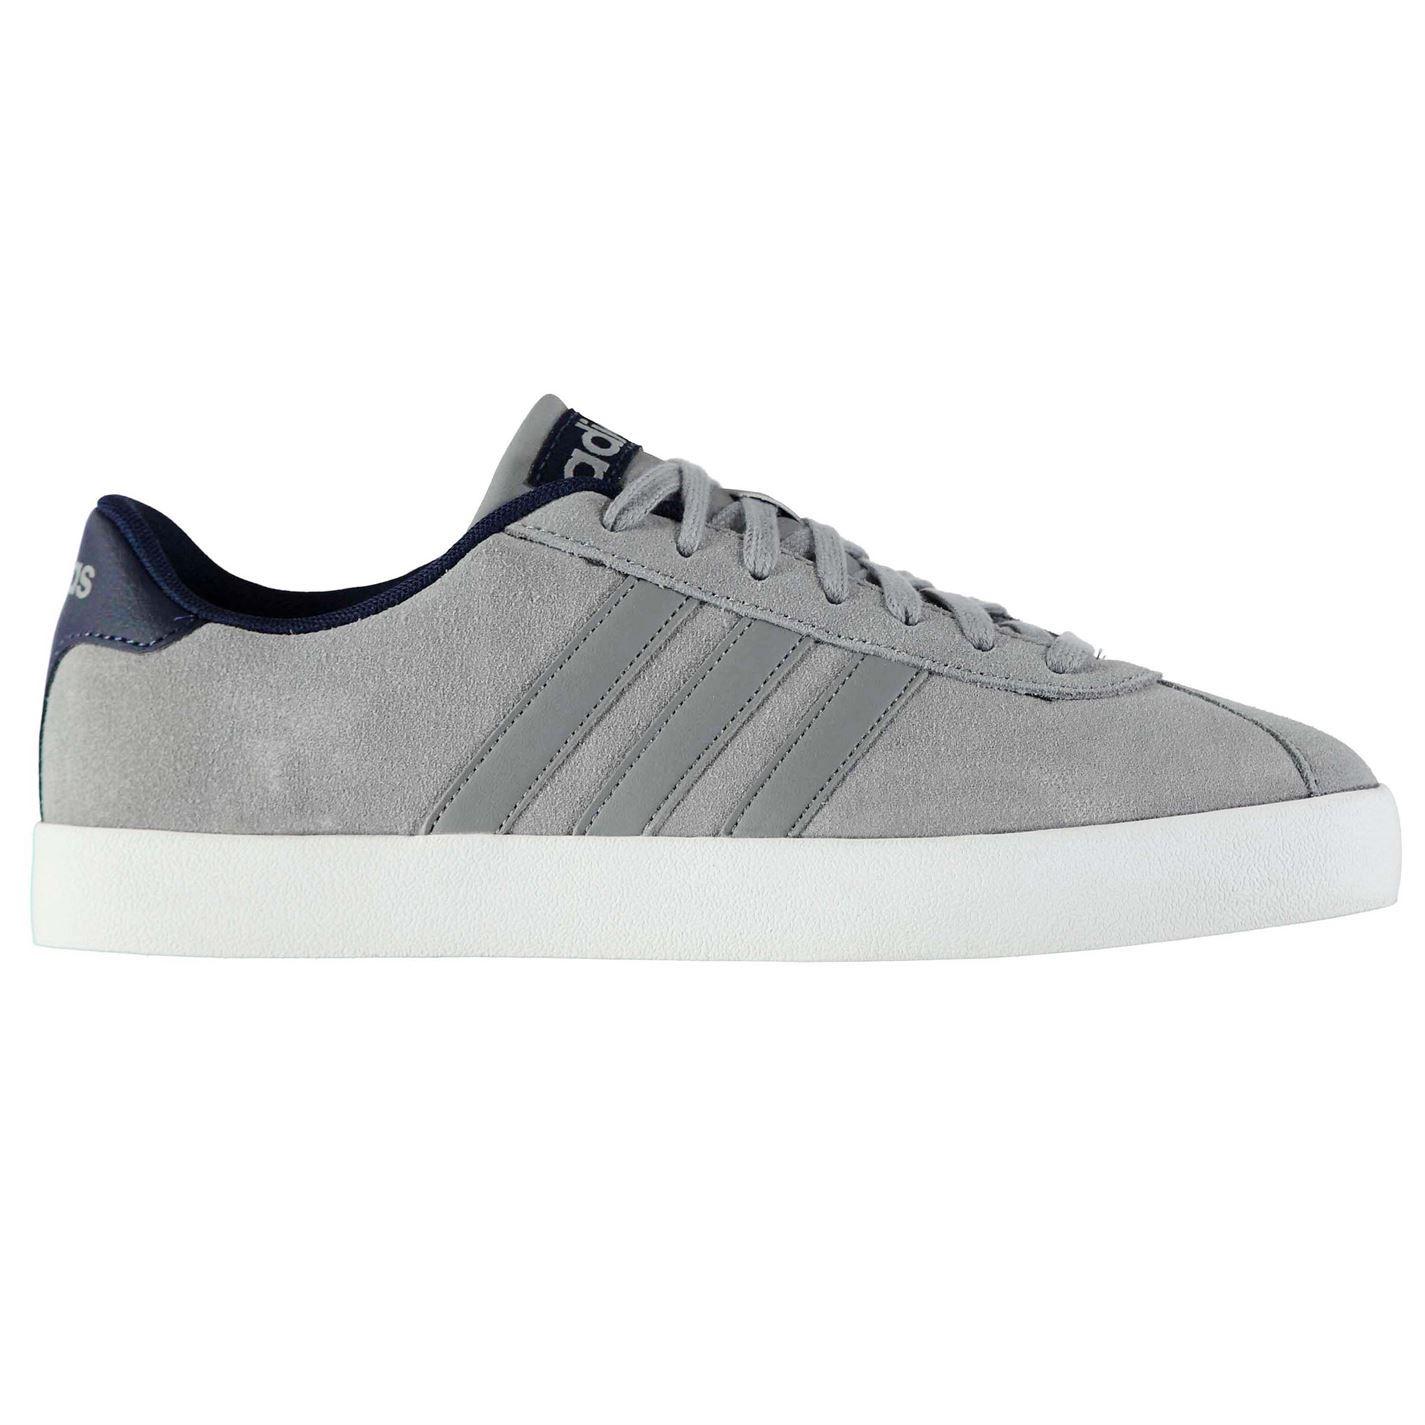 Adidas Adidas Adidas homme Gents Cour Vulc Baskets Chaussures Lacets fixé- cbc2af